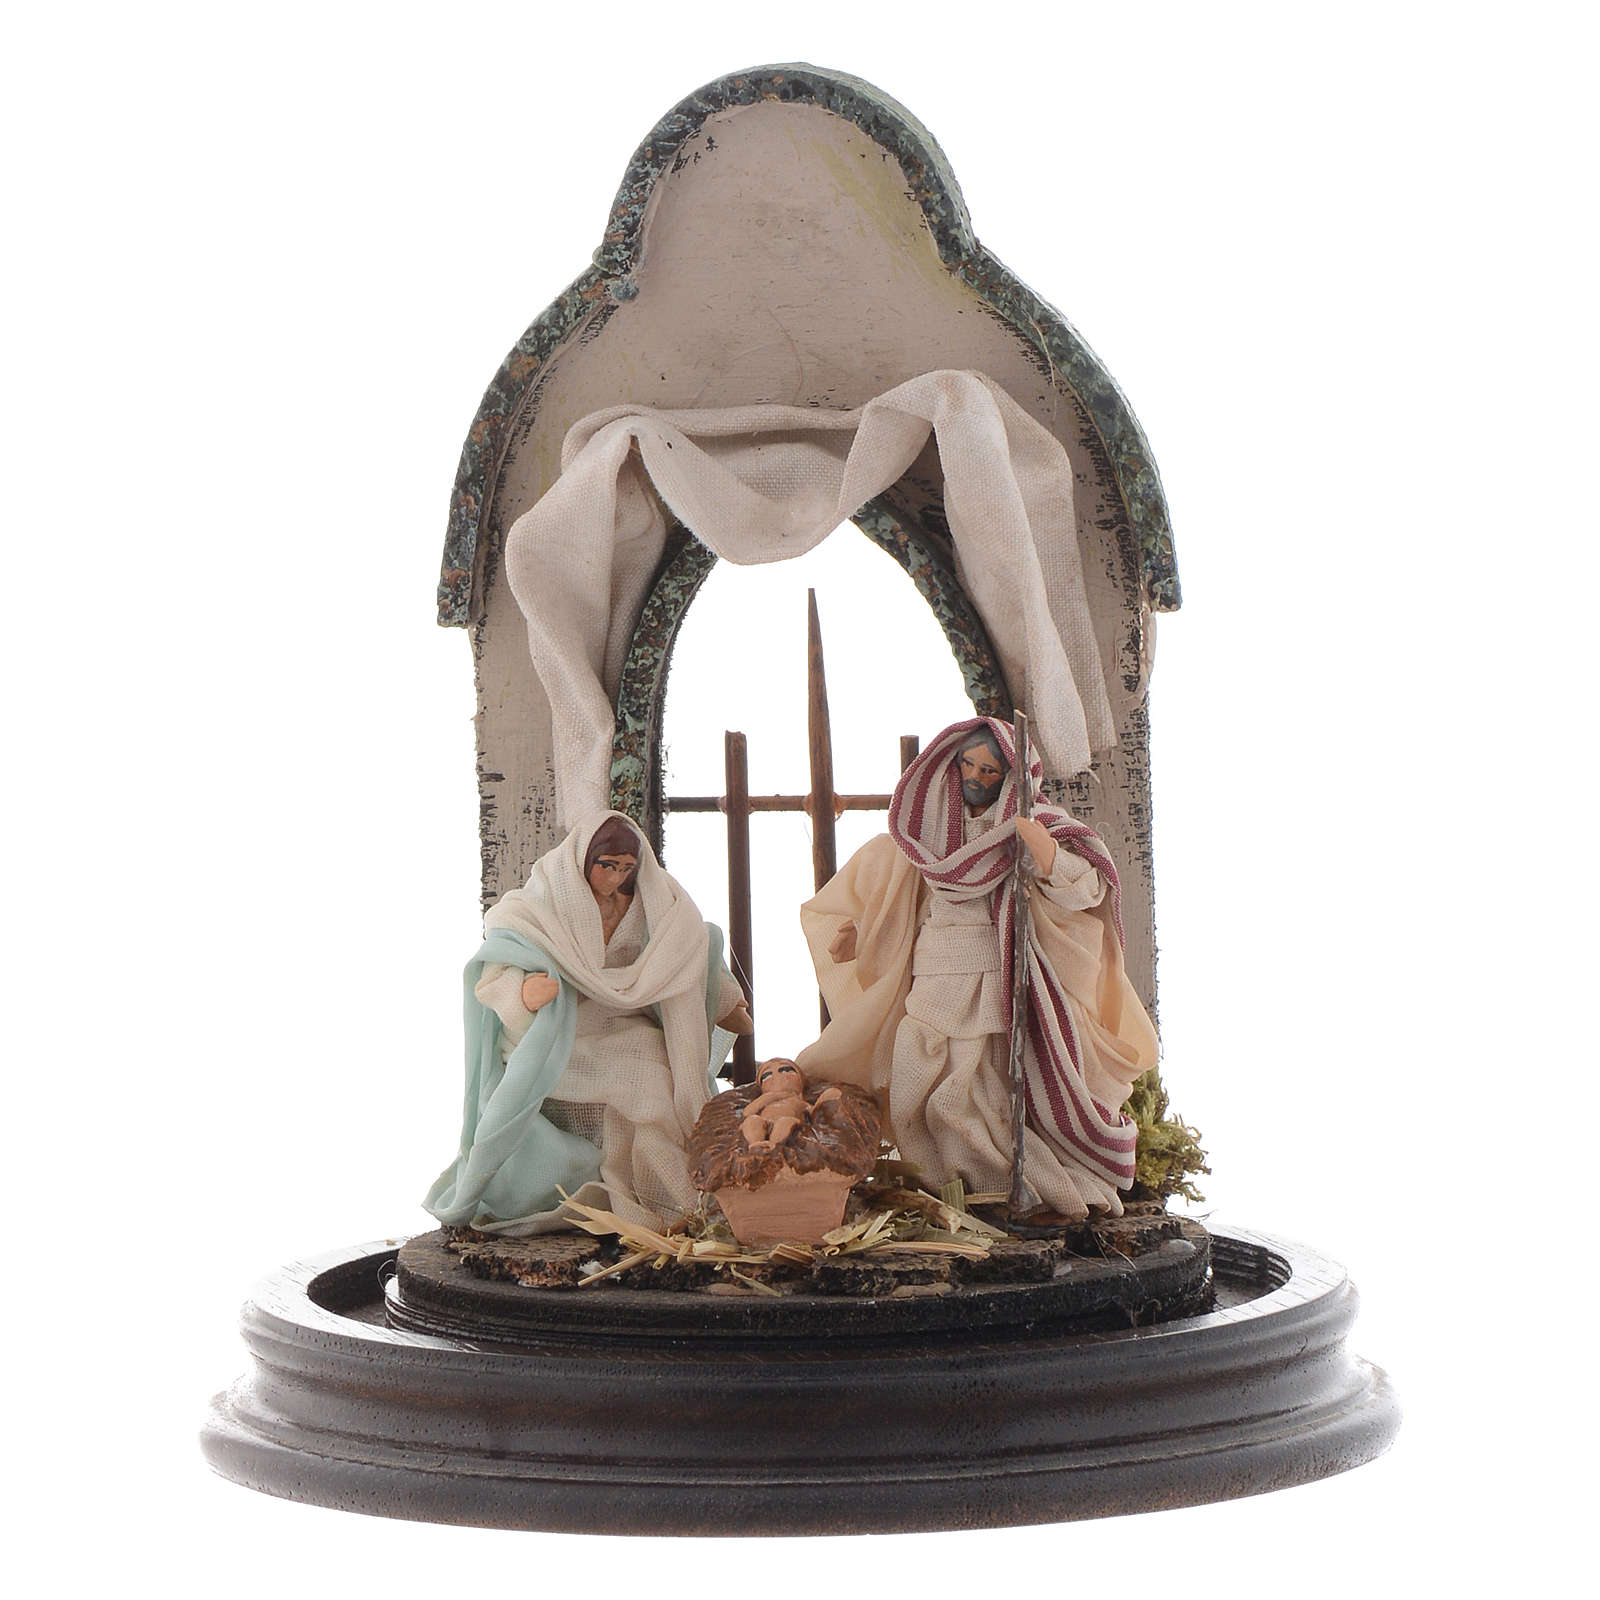 Neapolitan Nativity Scene Holy Family arabian style in glass dome 20x15 cm 4